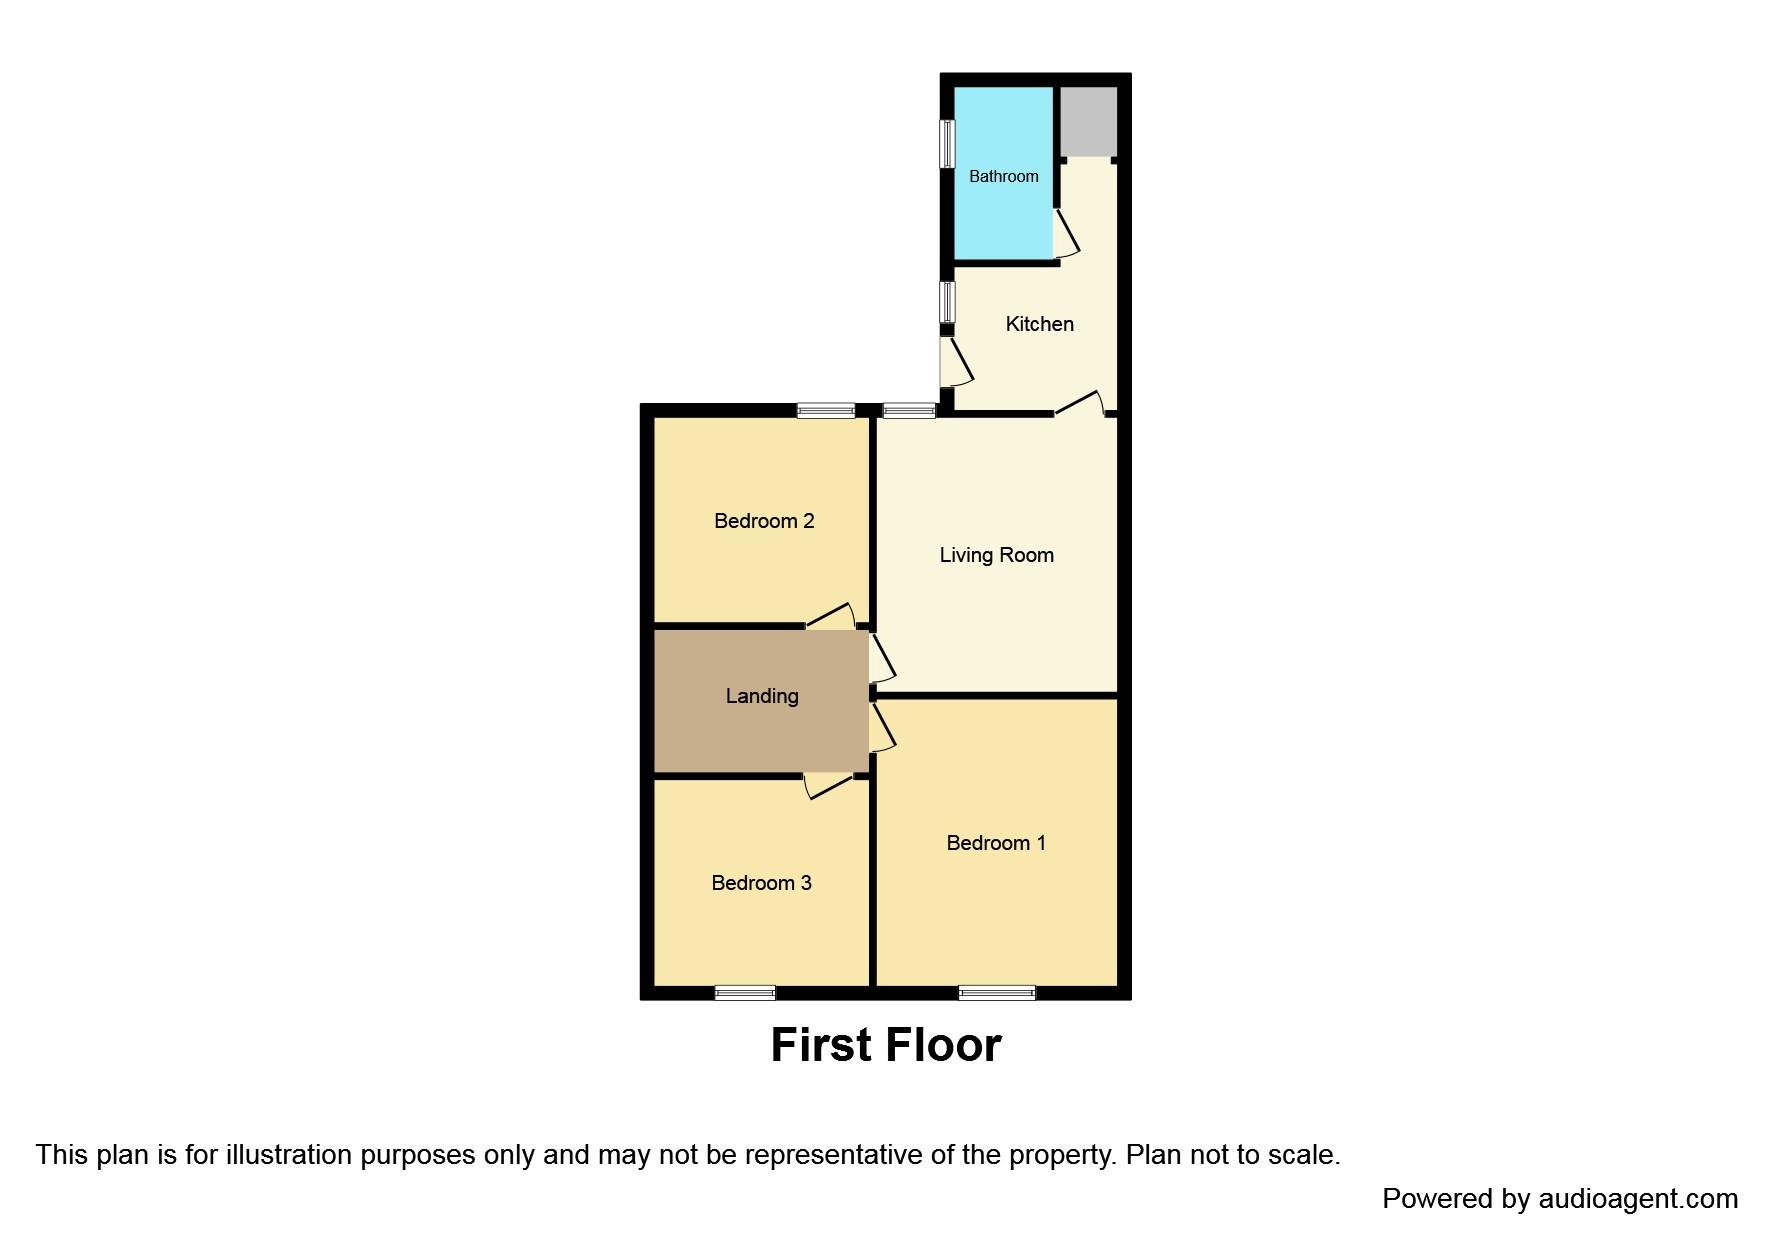 Original Floorplan.